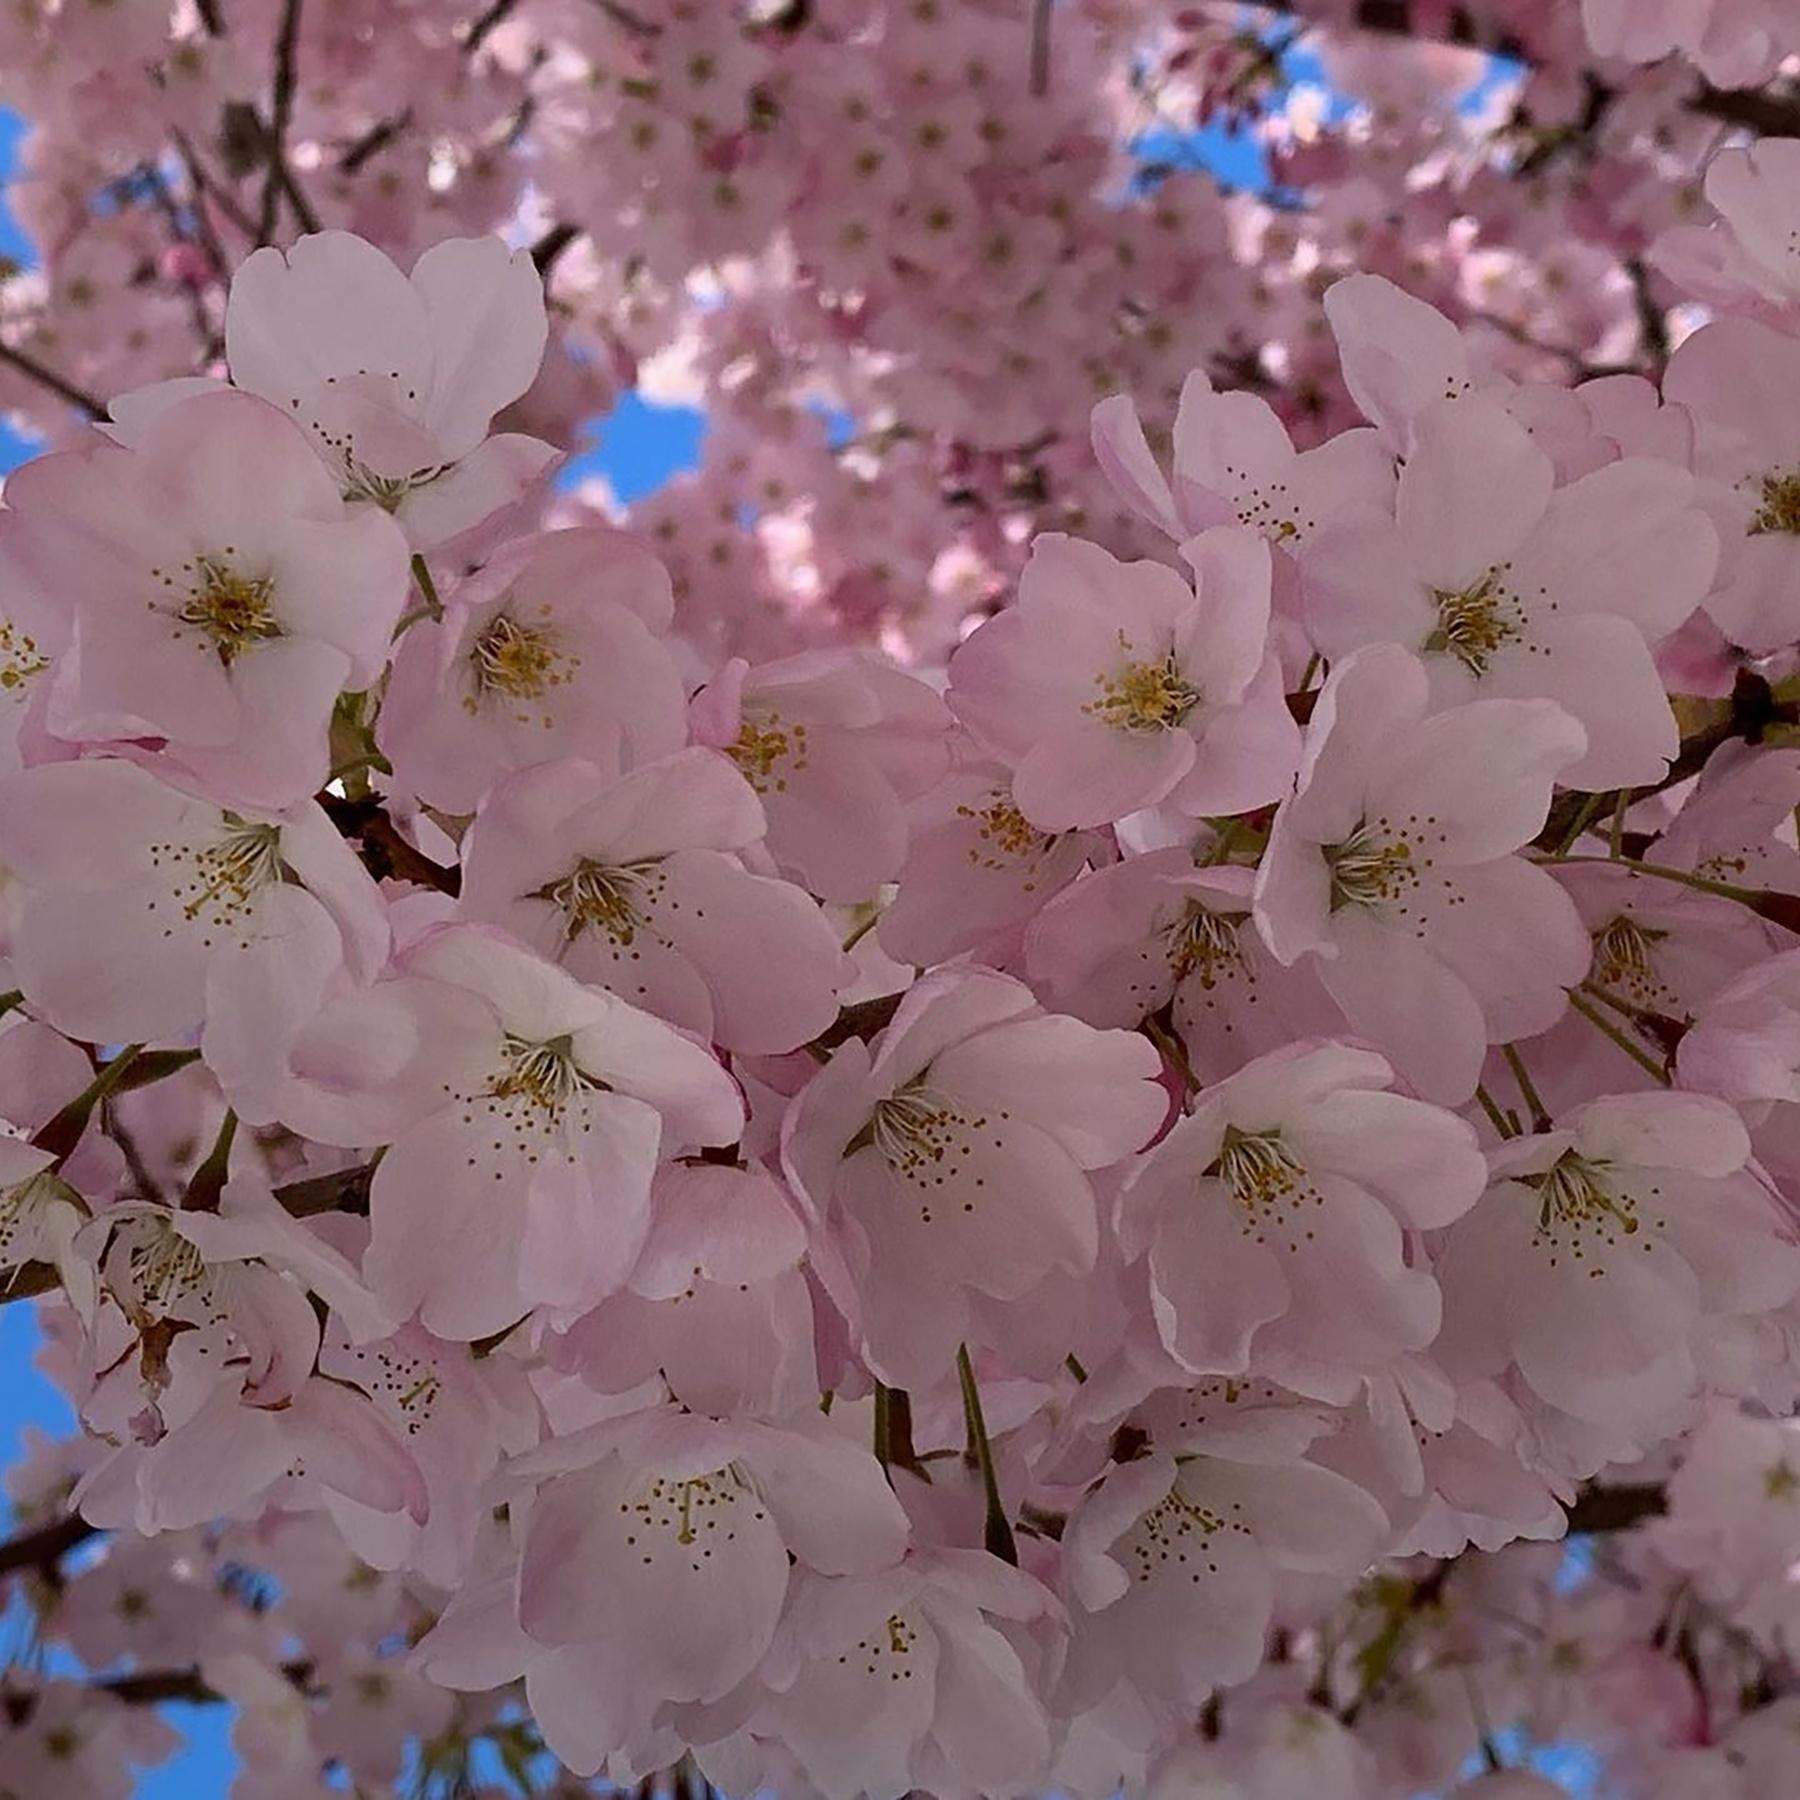 Close-up photo of cherry blossom flowers.